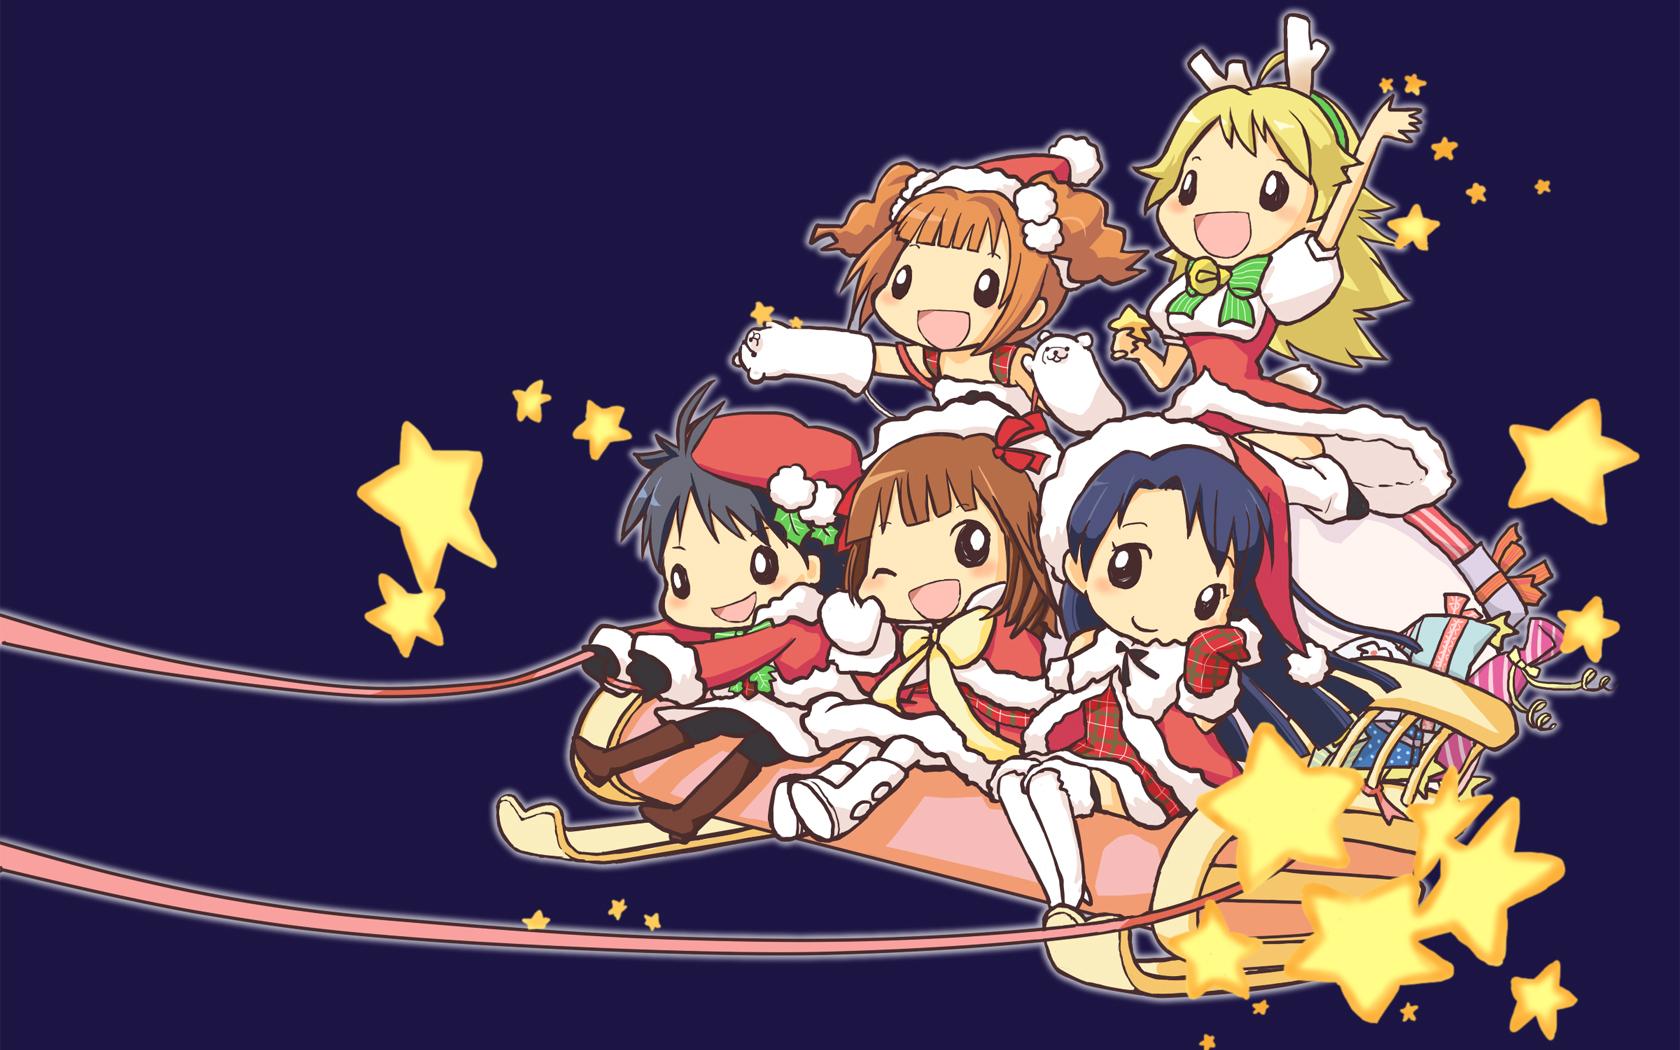 amami_haruka blue chibi christmas hoshii_miki idolmaster kikuchi_makoto kisaragi_chihaya takatsuki_yayoi